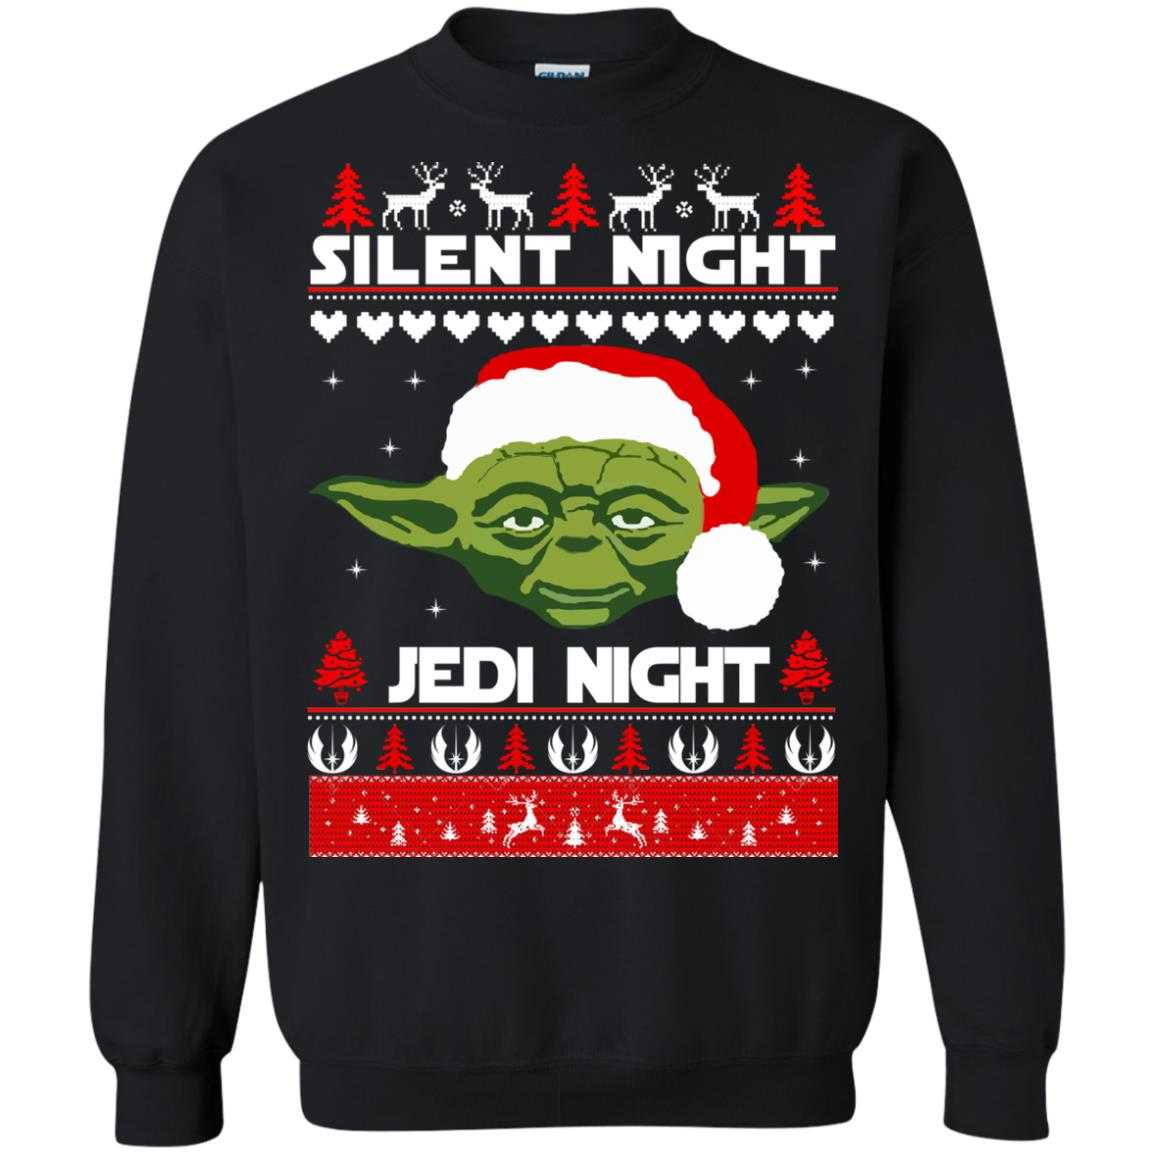 image 1560 - Yoda Star Wars: Silent Night Jedi Night Christmas Sweater, Hoodie